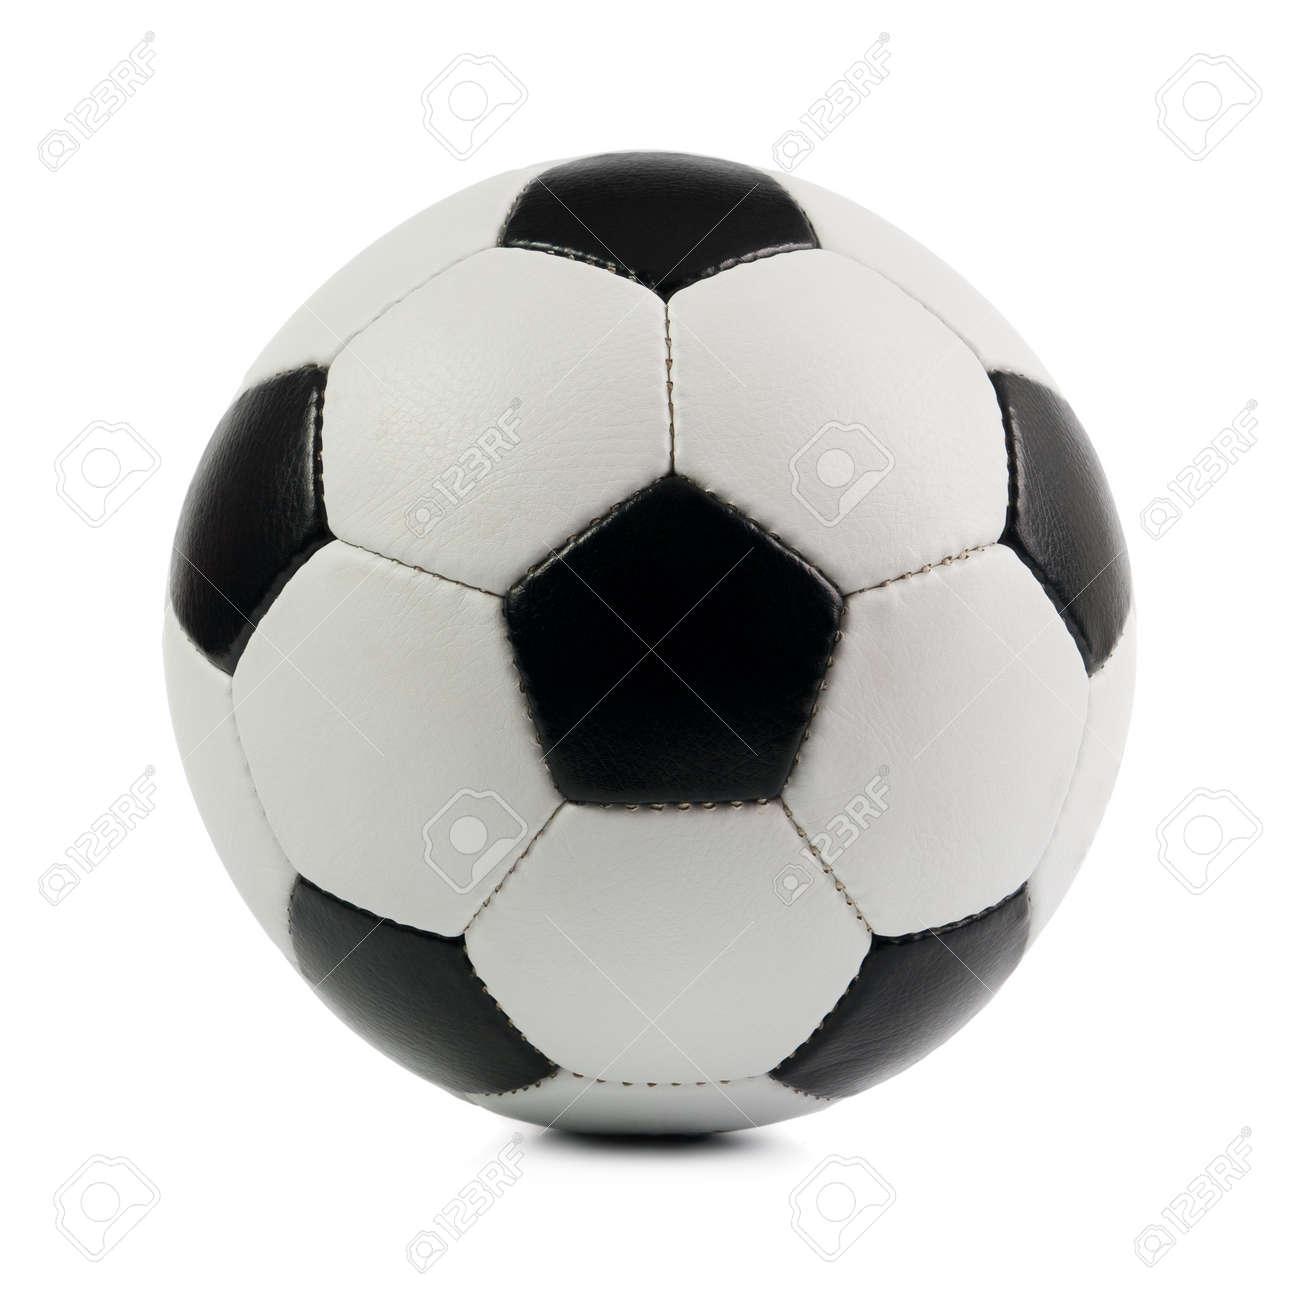 Football. Isolated on white background. Stock Photo - 9871251